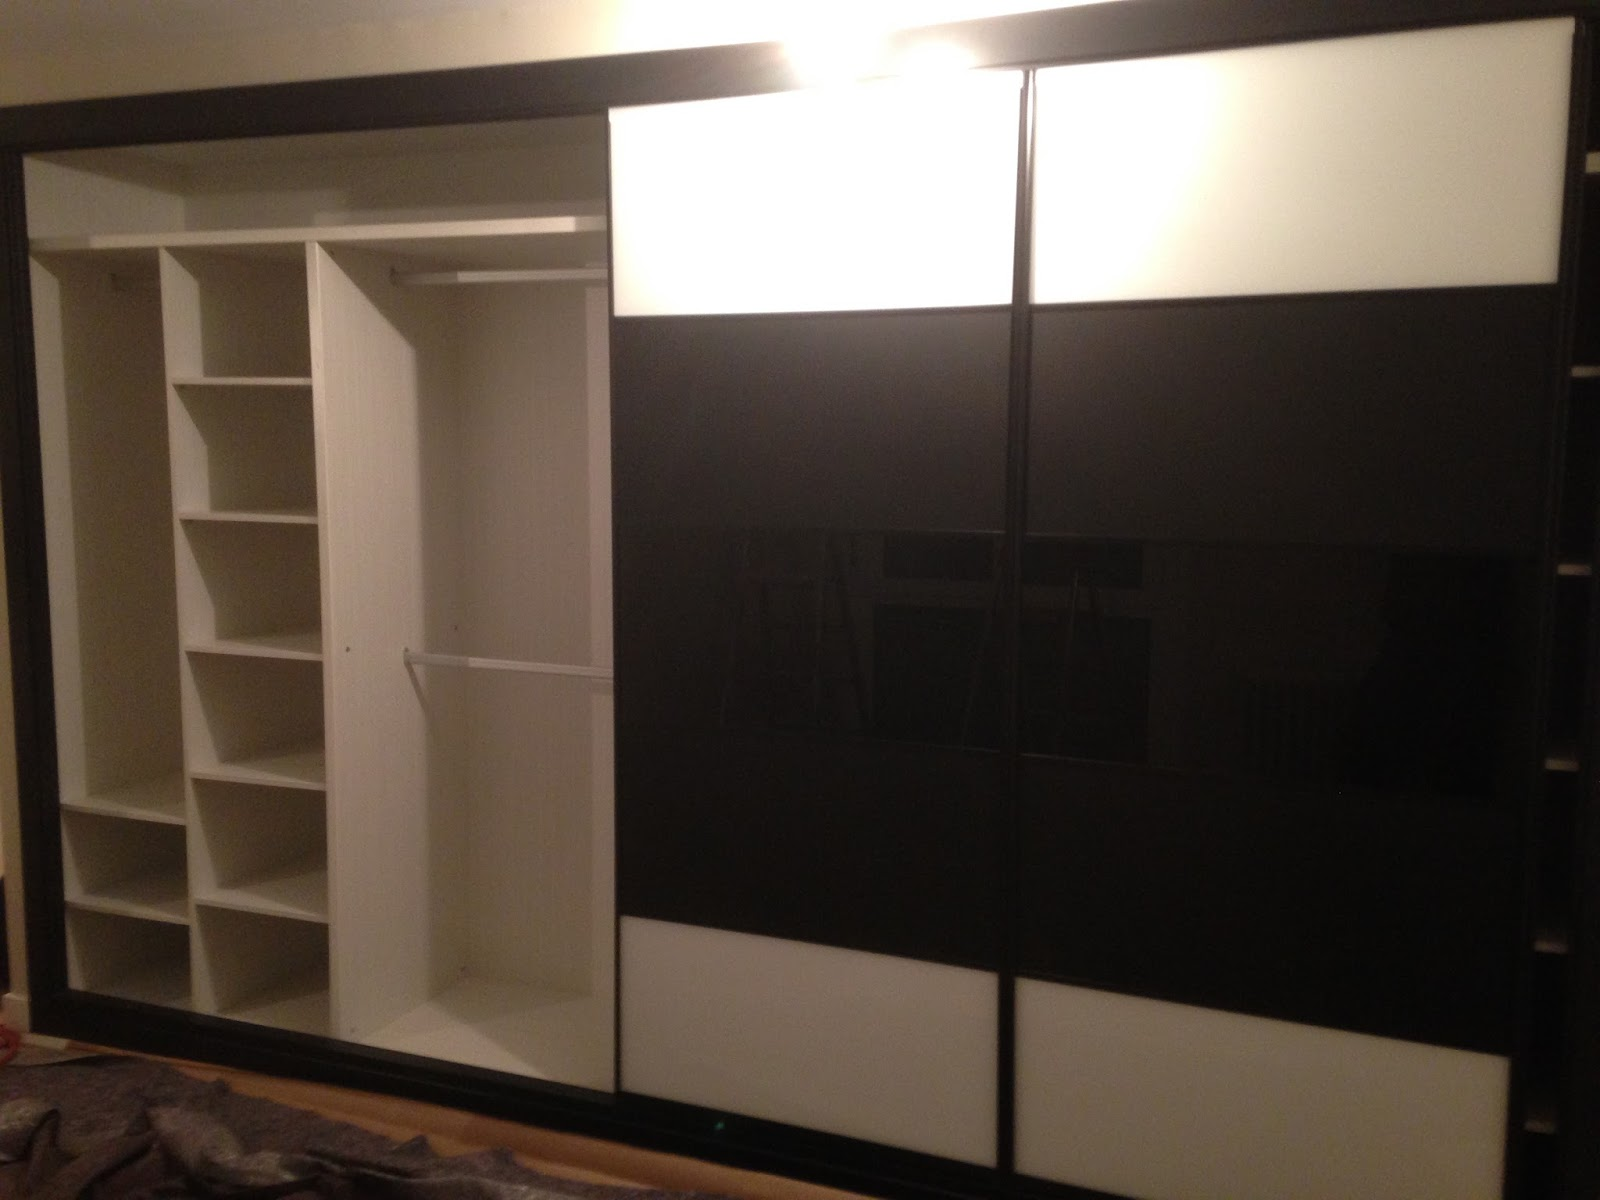 Dise o de interior de armarios empotrados ch decora - Zapateros interior armario ...